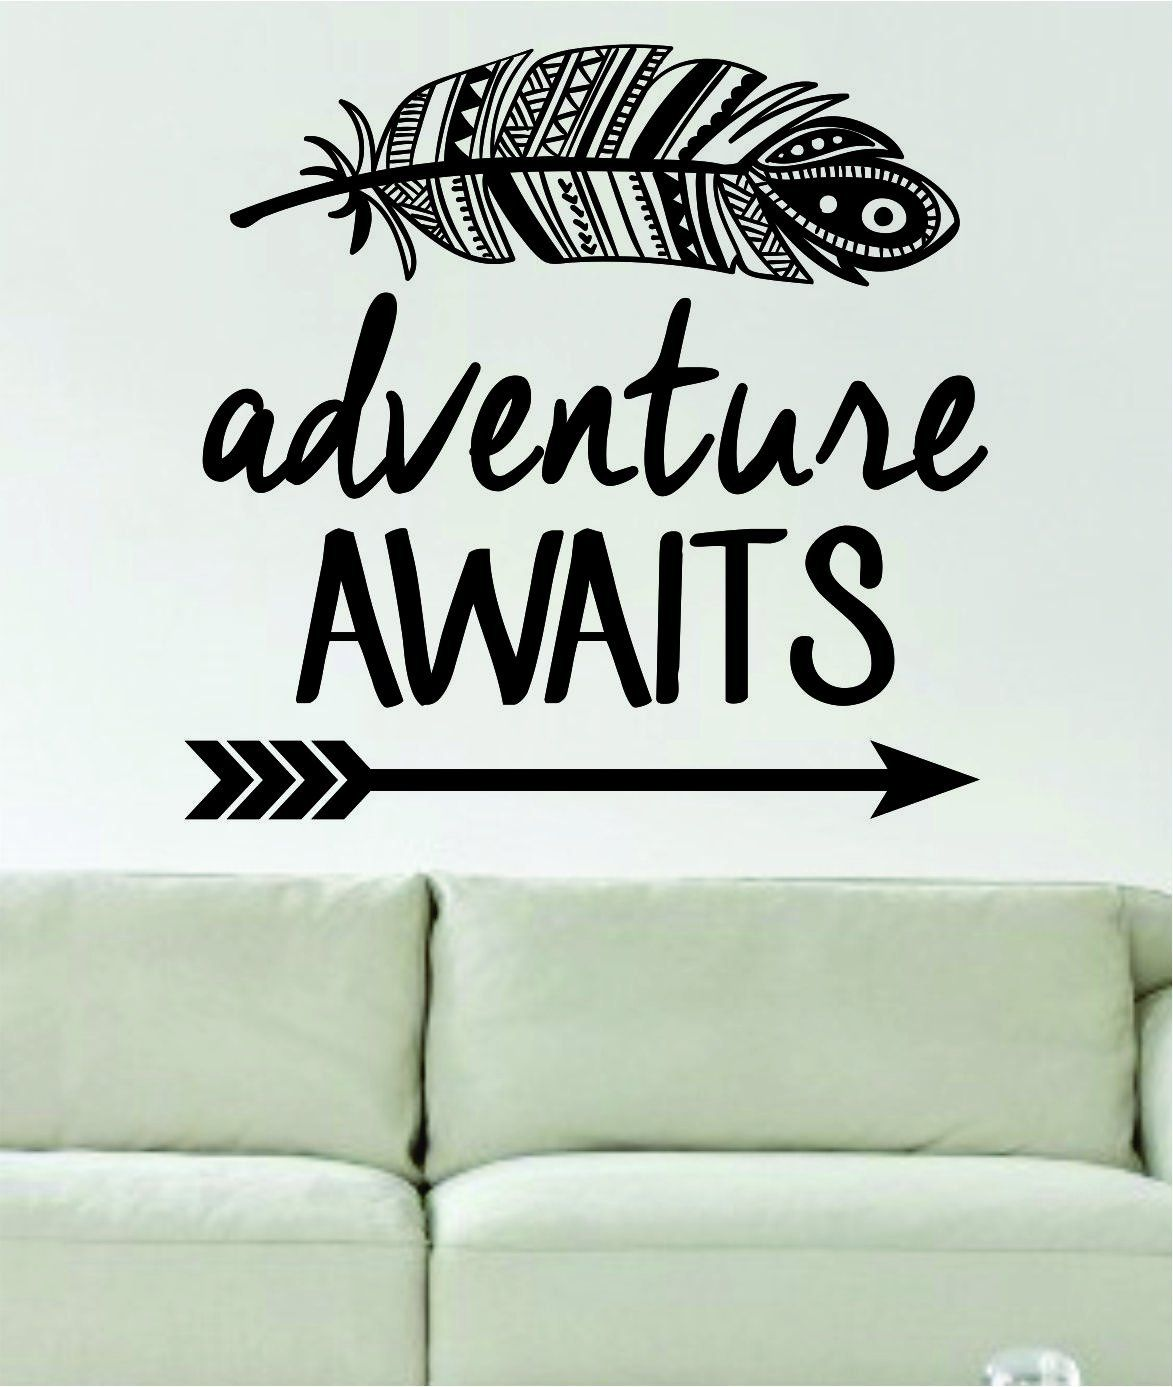 Amazon Com Adventure Awaits Feather And Arrow Design Decal Sticker Wall Vinyl Art Words Decor Home Improvement Vinyl Wall Vinyl Wall Art Decal Wall Art [ 1387 x 1173 Pixel ]